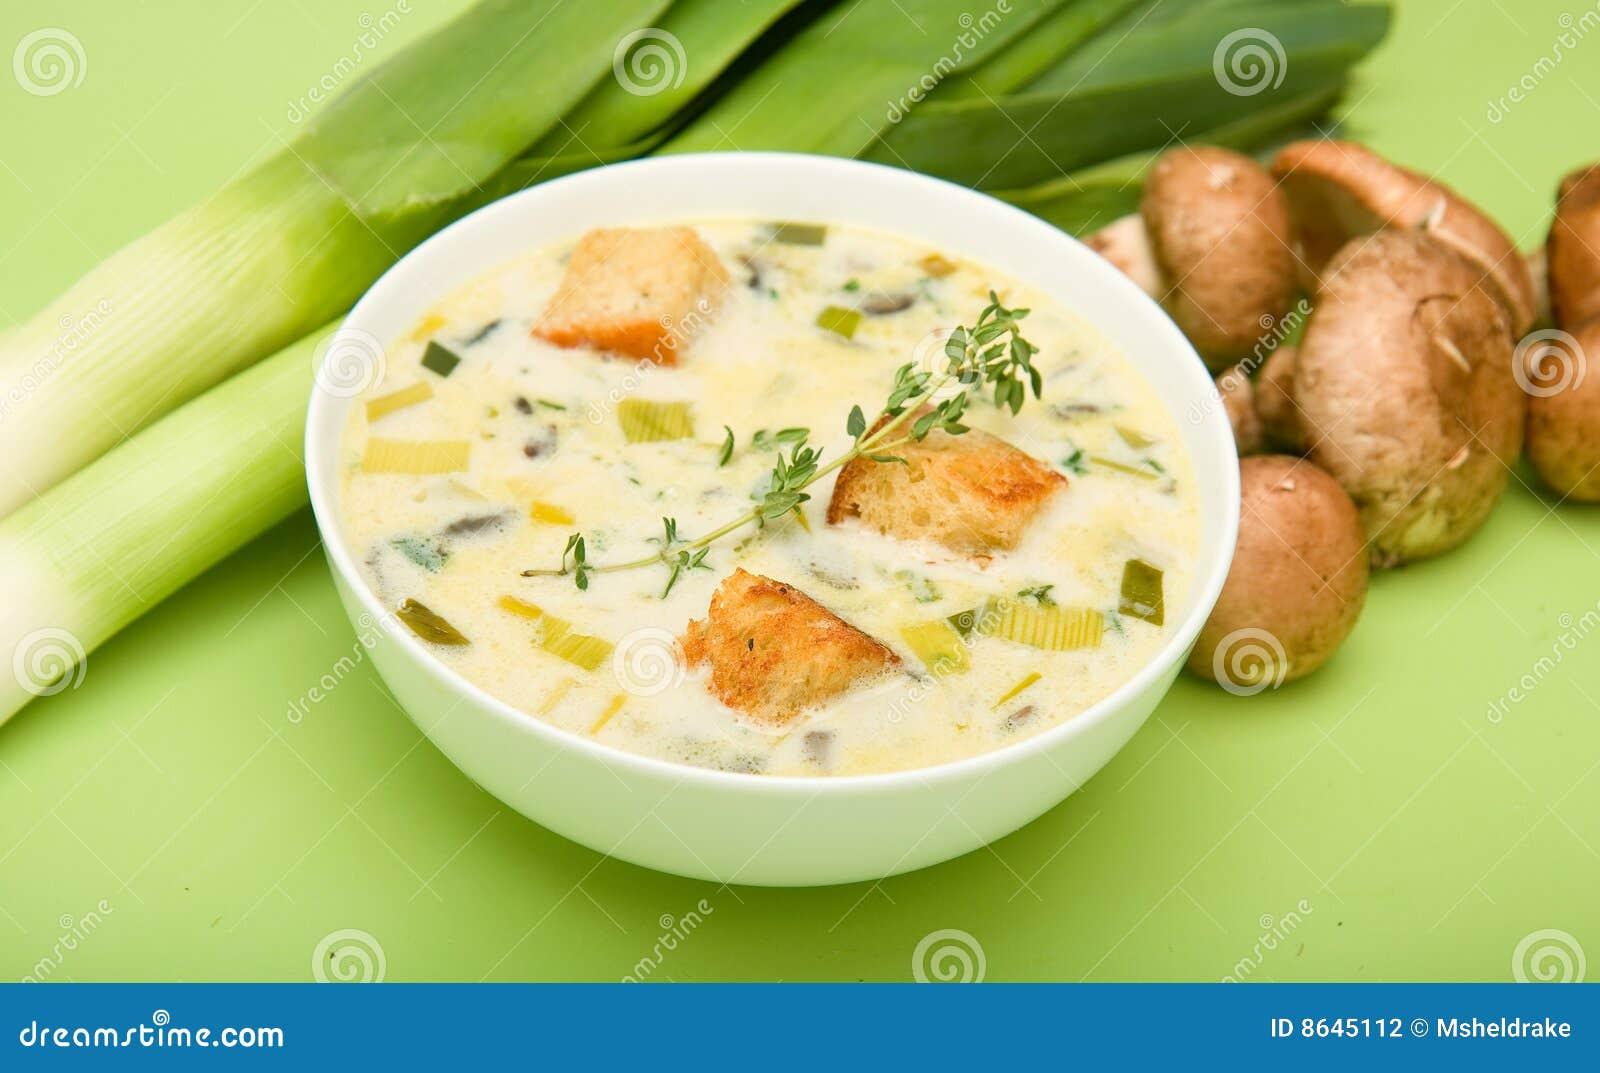 Cream of Mushroom and Leek soup presented with Mushrooms and Leeks.